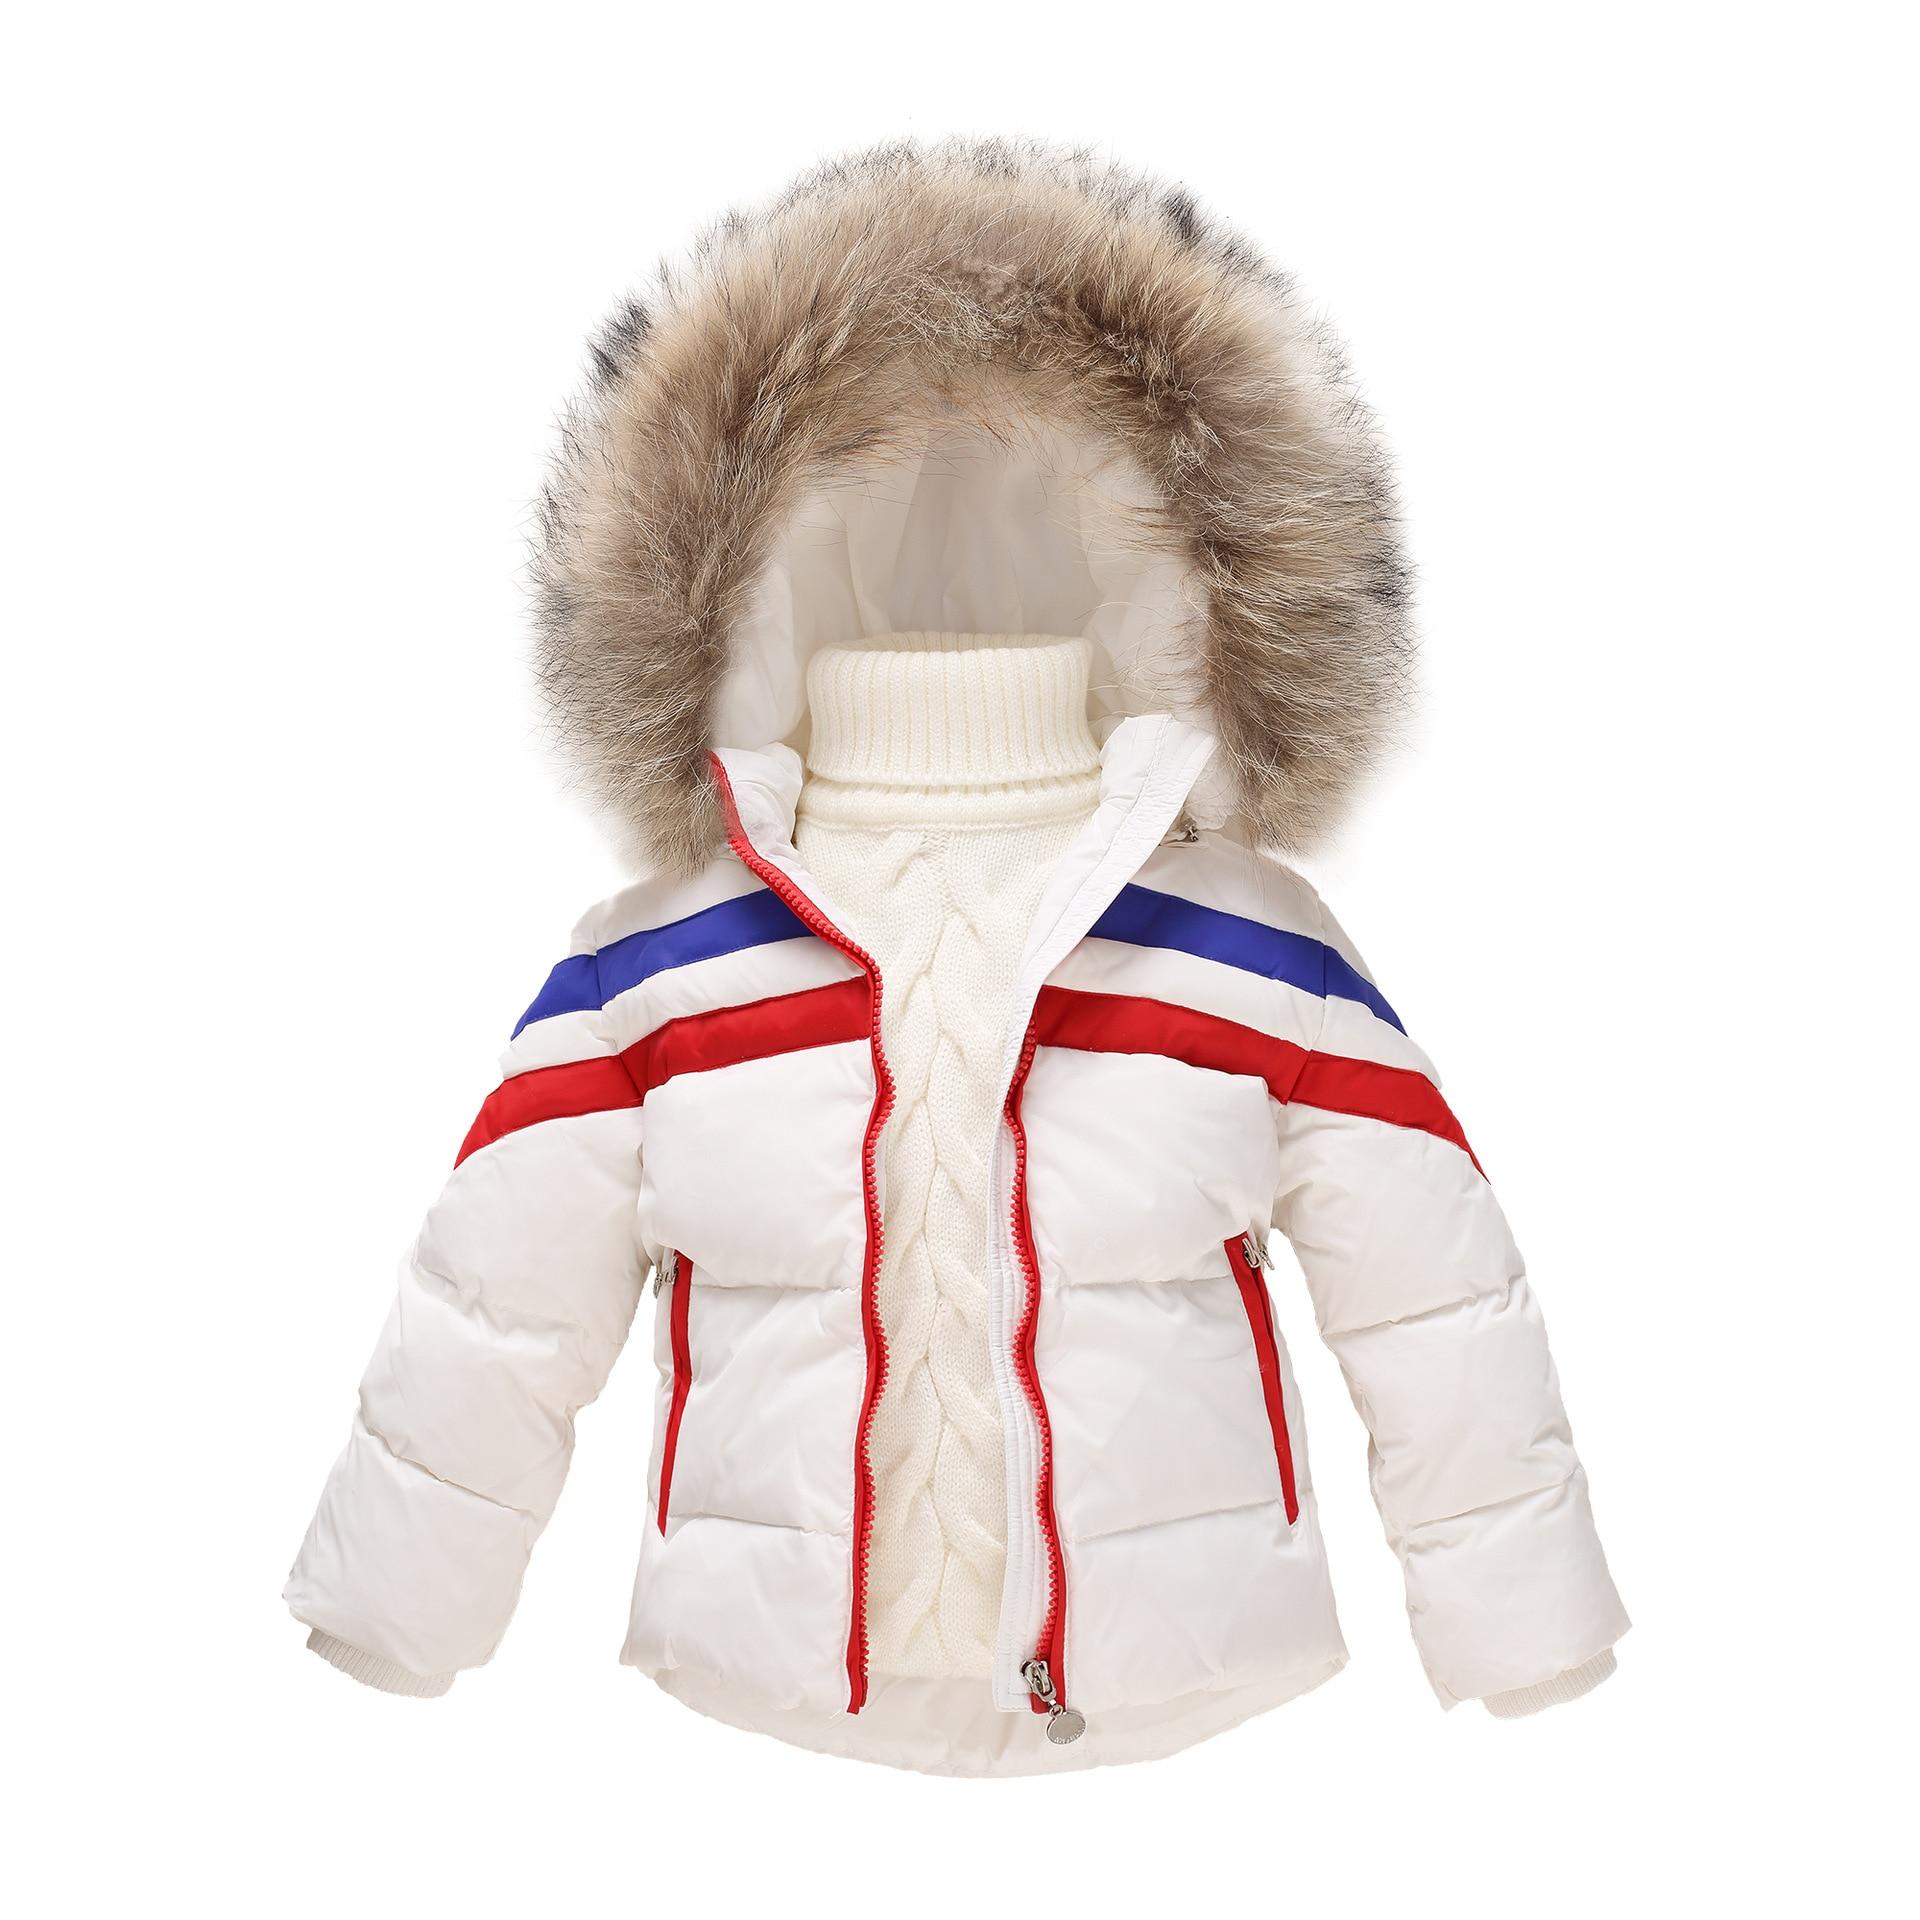 Fashion 2017 Children clothing down Jacket Girls Winter Coat unisex kids wear warm girls parka 2-8 yearls old boys clothing цена 2017